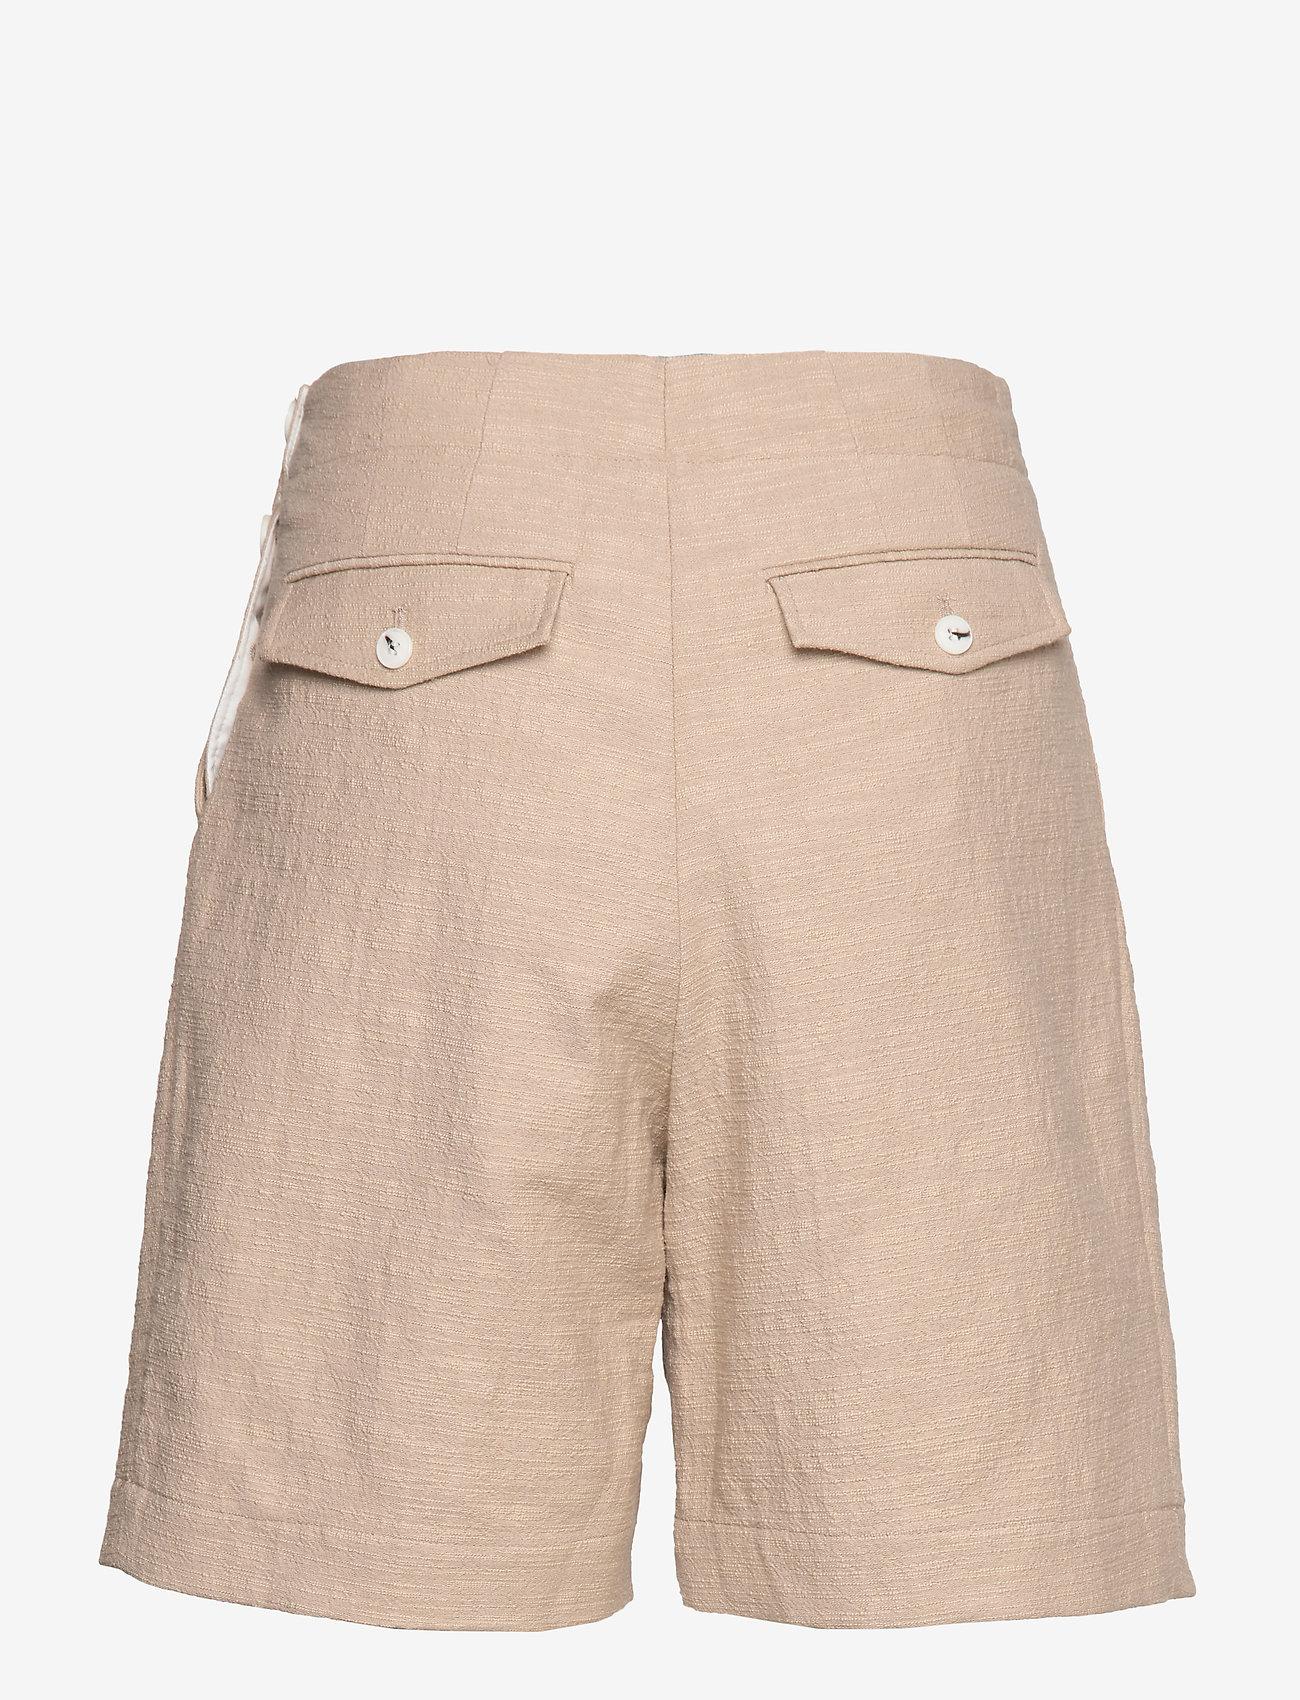 Wood Wood - Birgit shorts - bermudas - khaki - 1